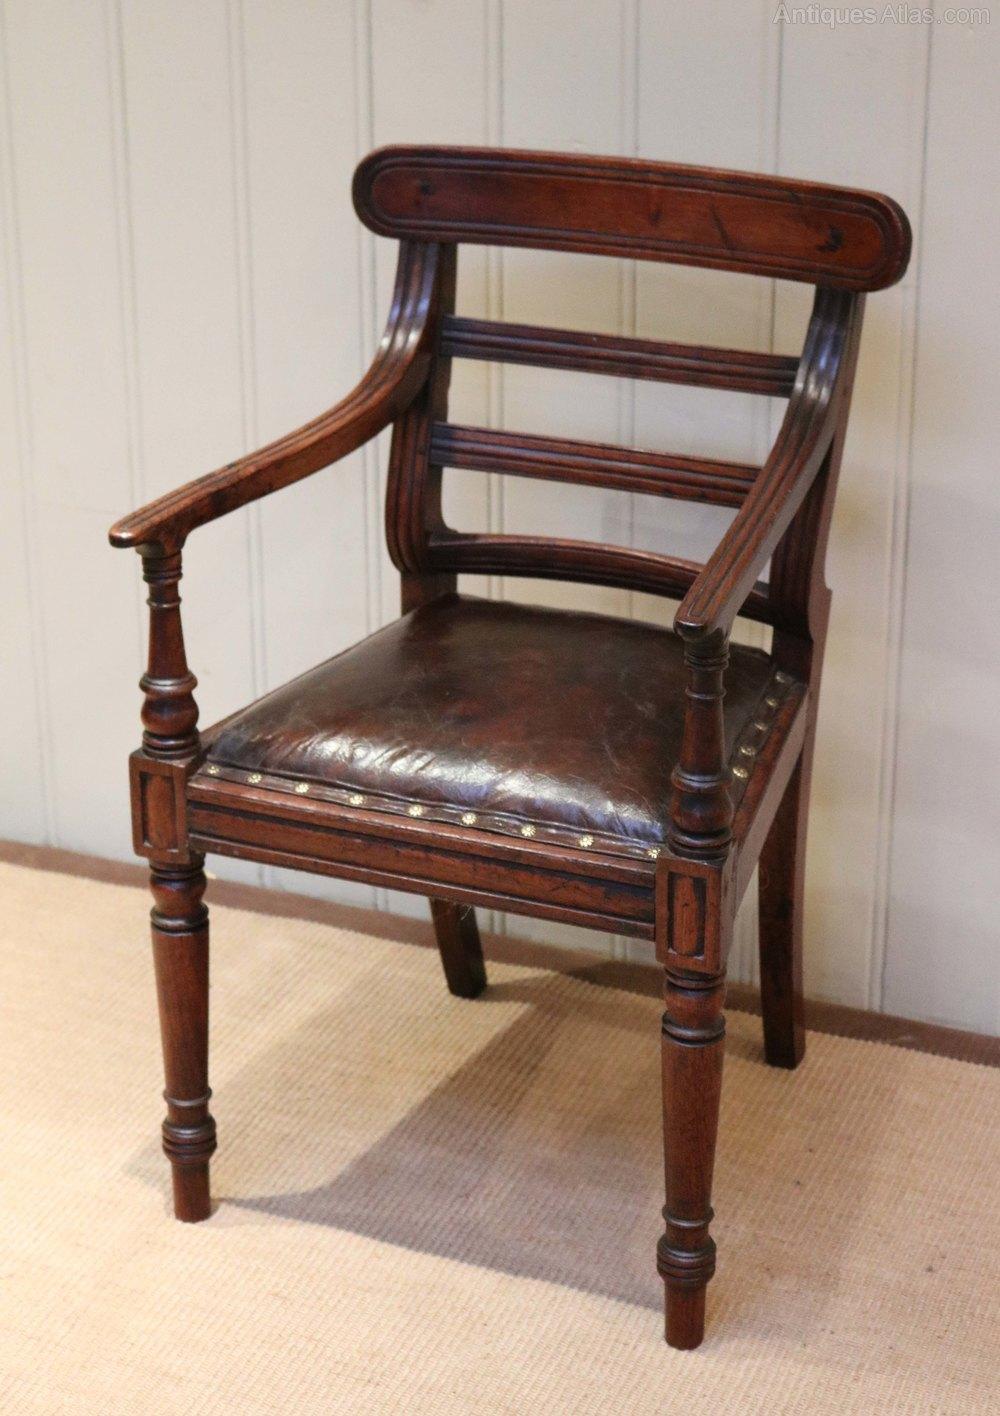 Regency Mahogany Childrens Chair Antique Childs Chairs Regency Mahogany  %%alt5%% ... - Regency Mahogany Children's Chair - Antiques Atlas